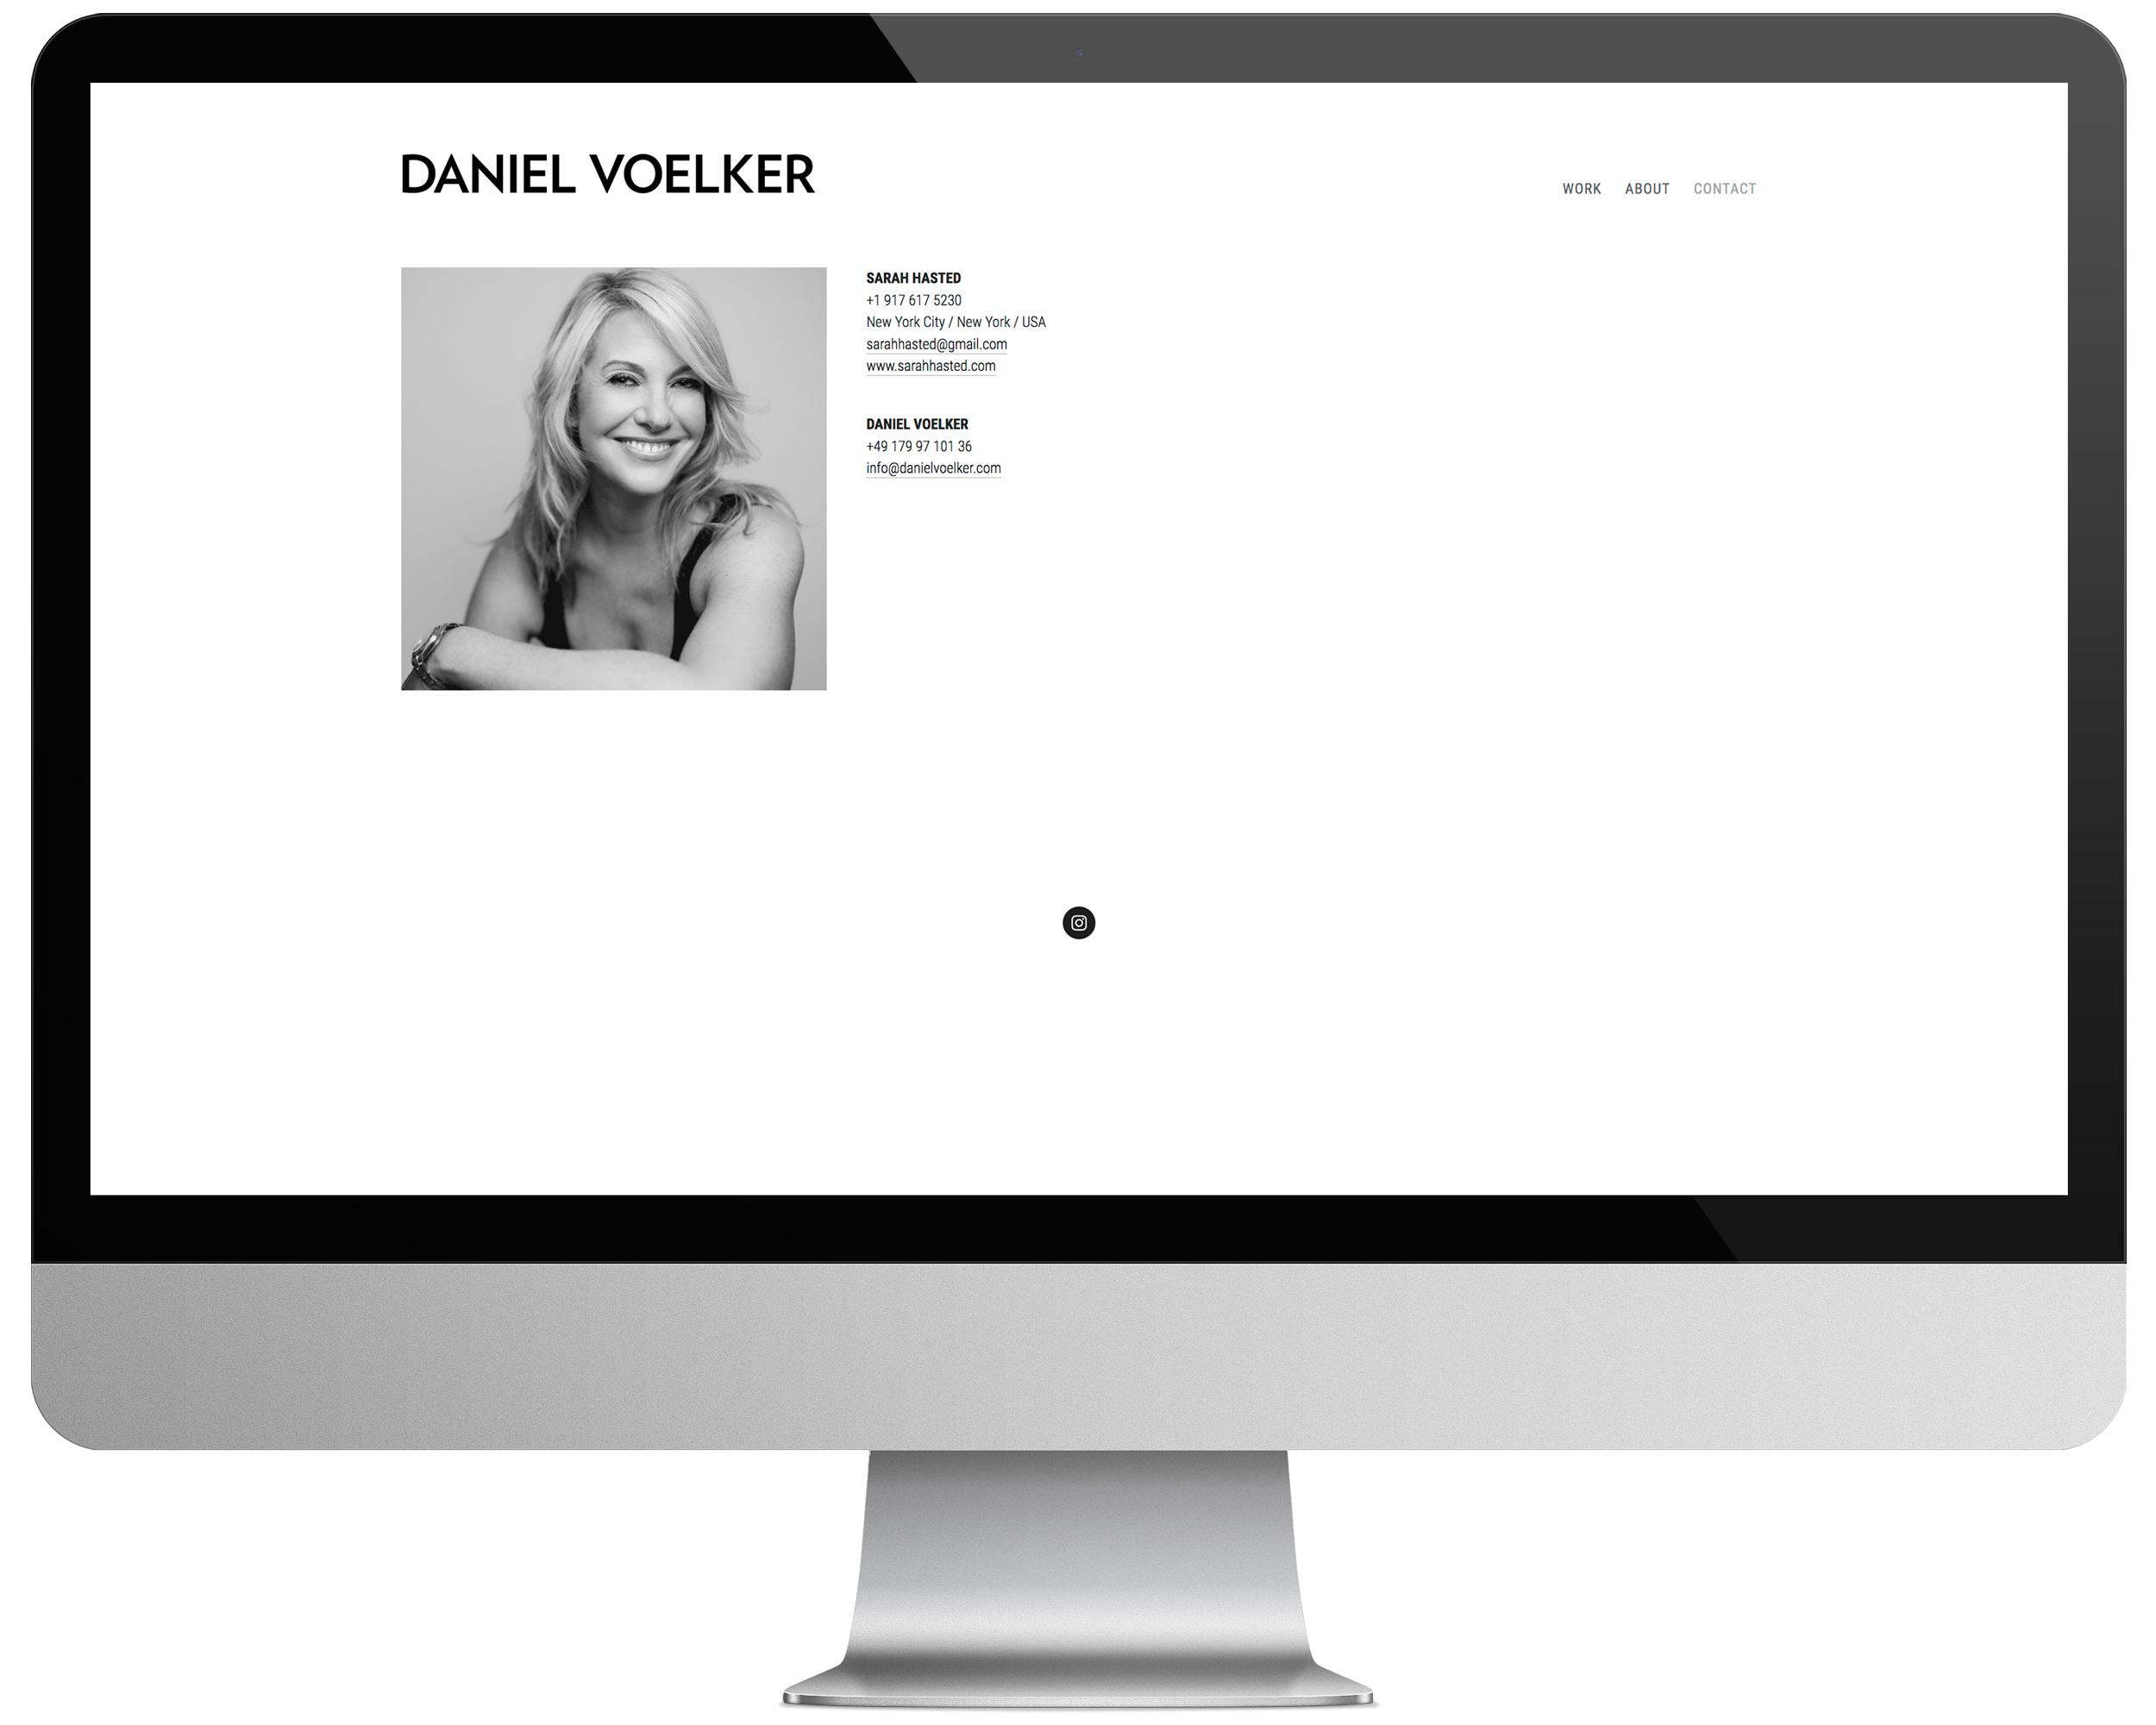 004_Daniel-Voelker_iMAC_2500x2000.jpg